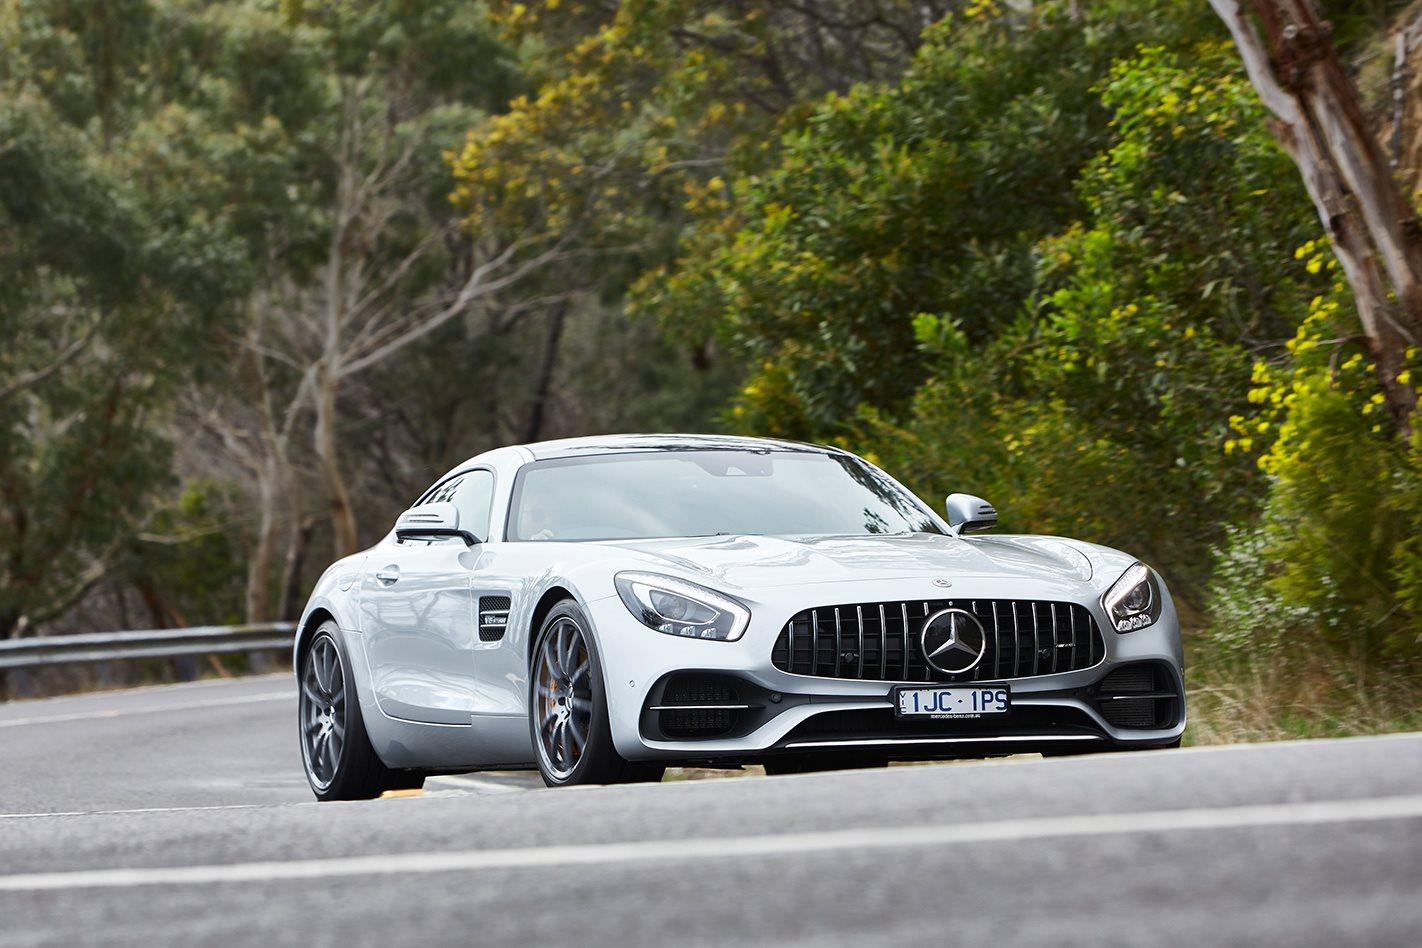 2017 Mercedes-AMG GT S drive.jpg